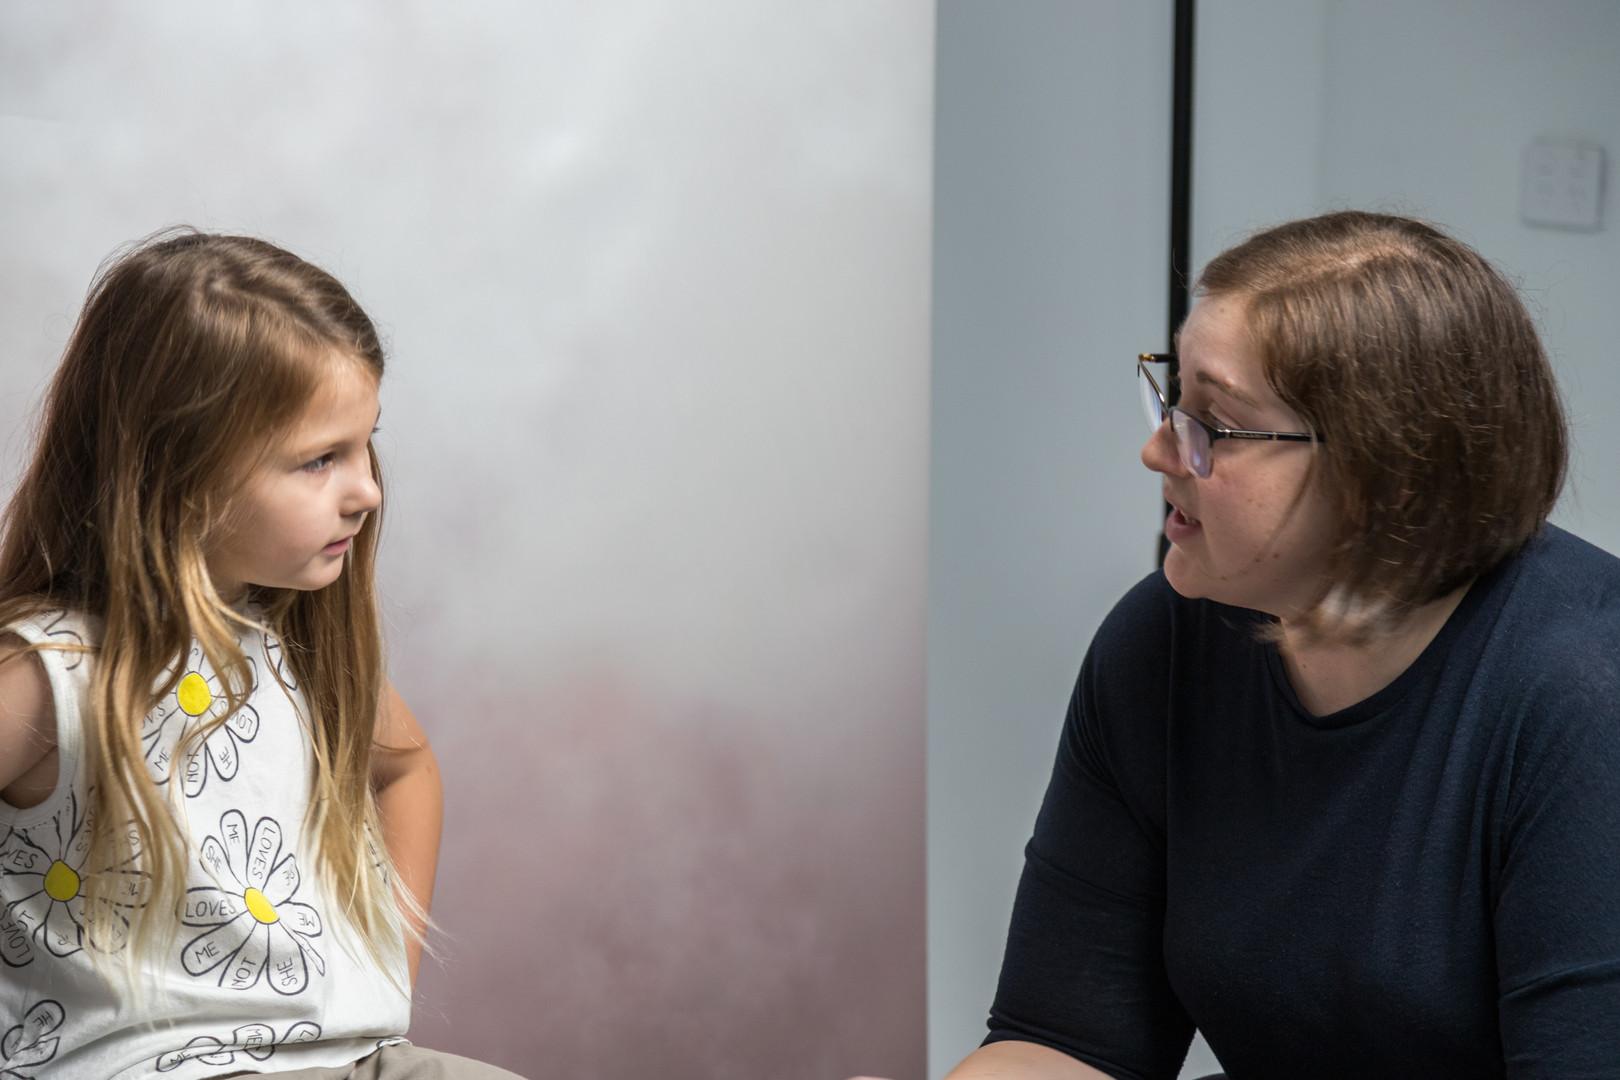 Amanda Kaye (Director) talking with Willow Viney (Jacqualine)